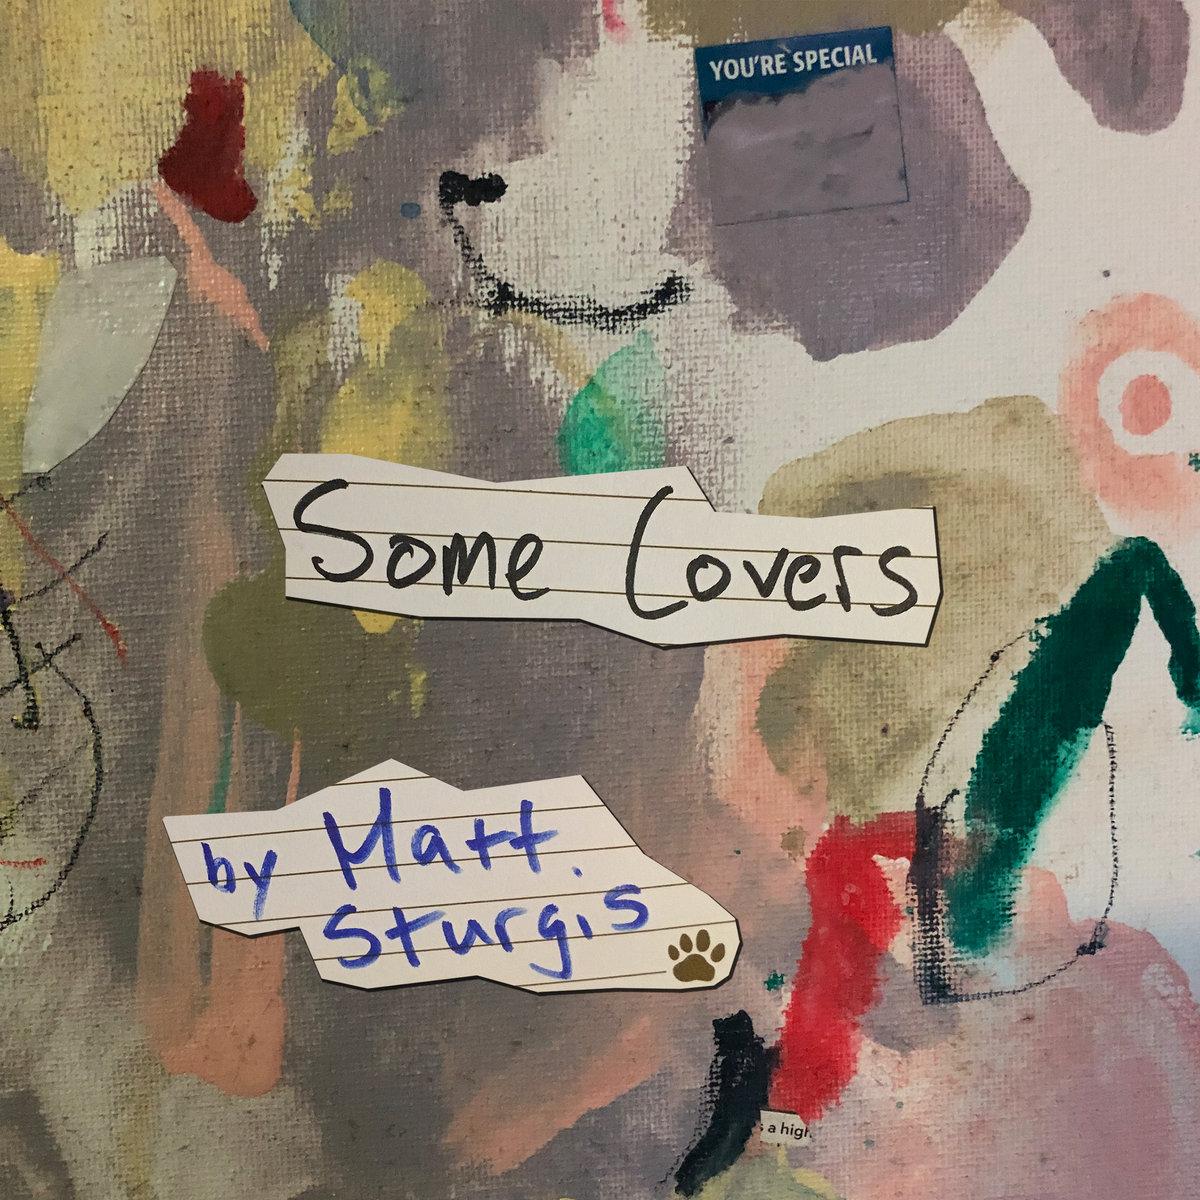 Torn by Ednaswap by Natalie Imbruglia   Matt Sturgis